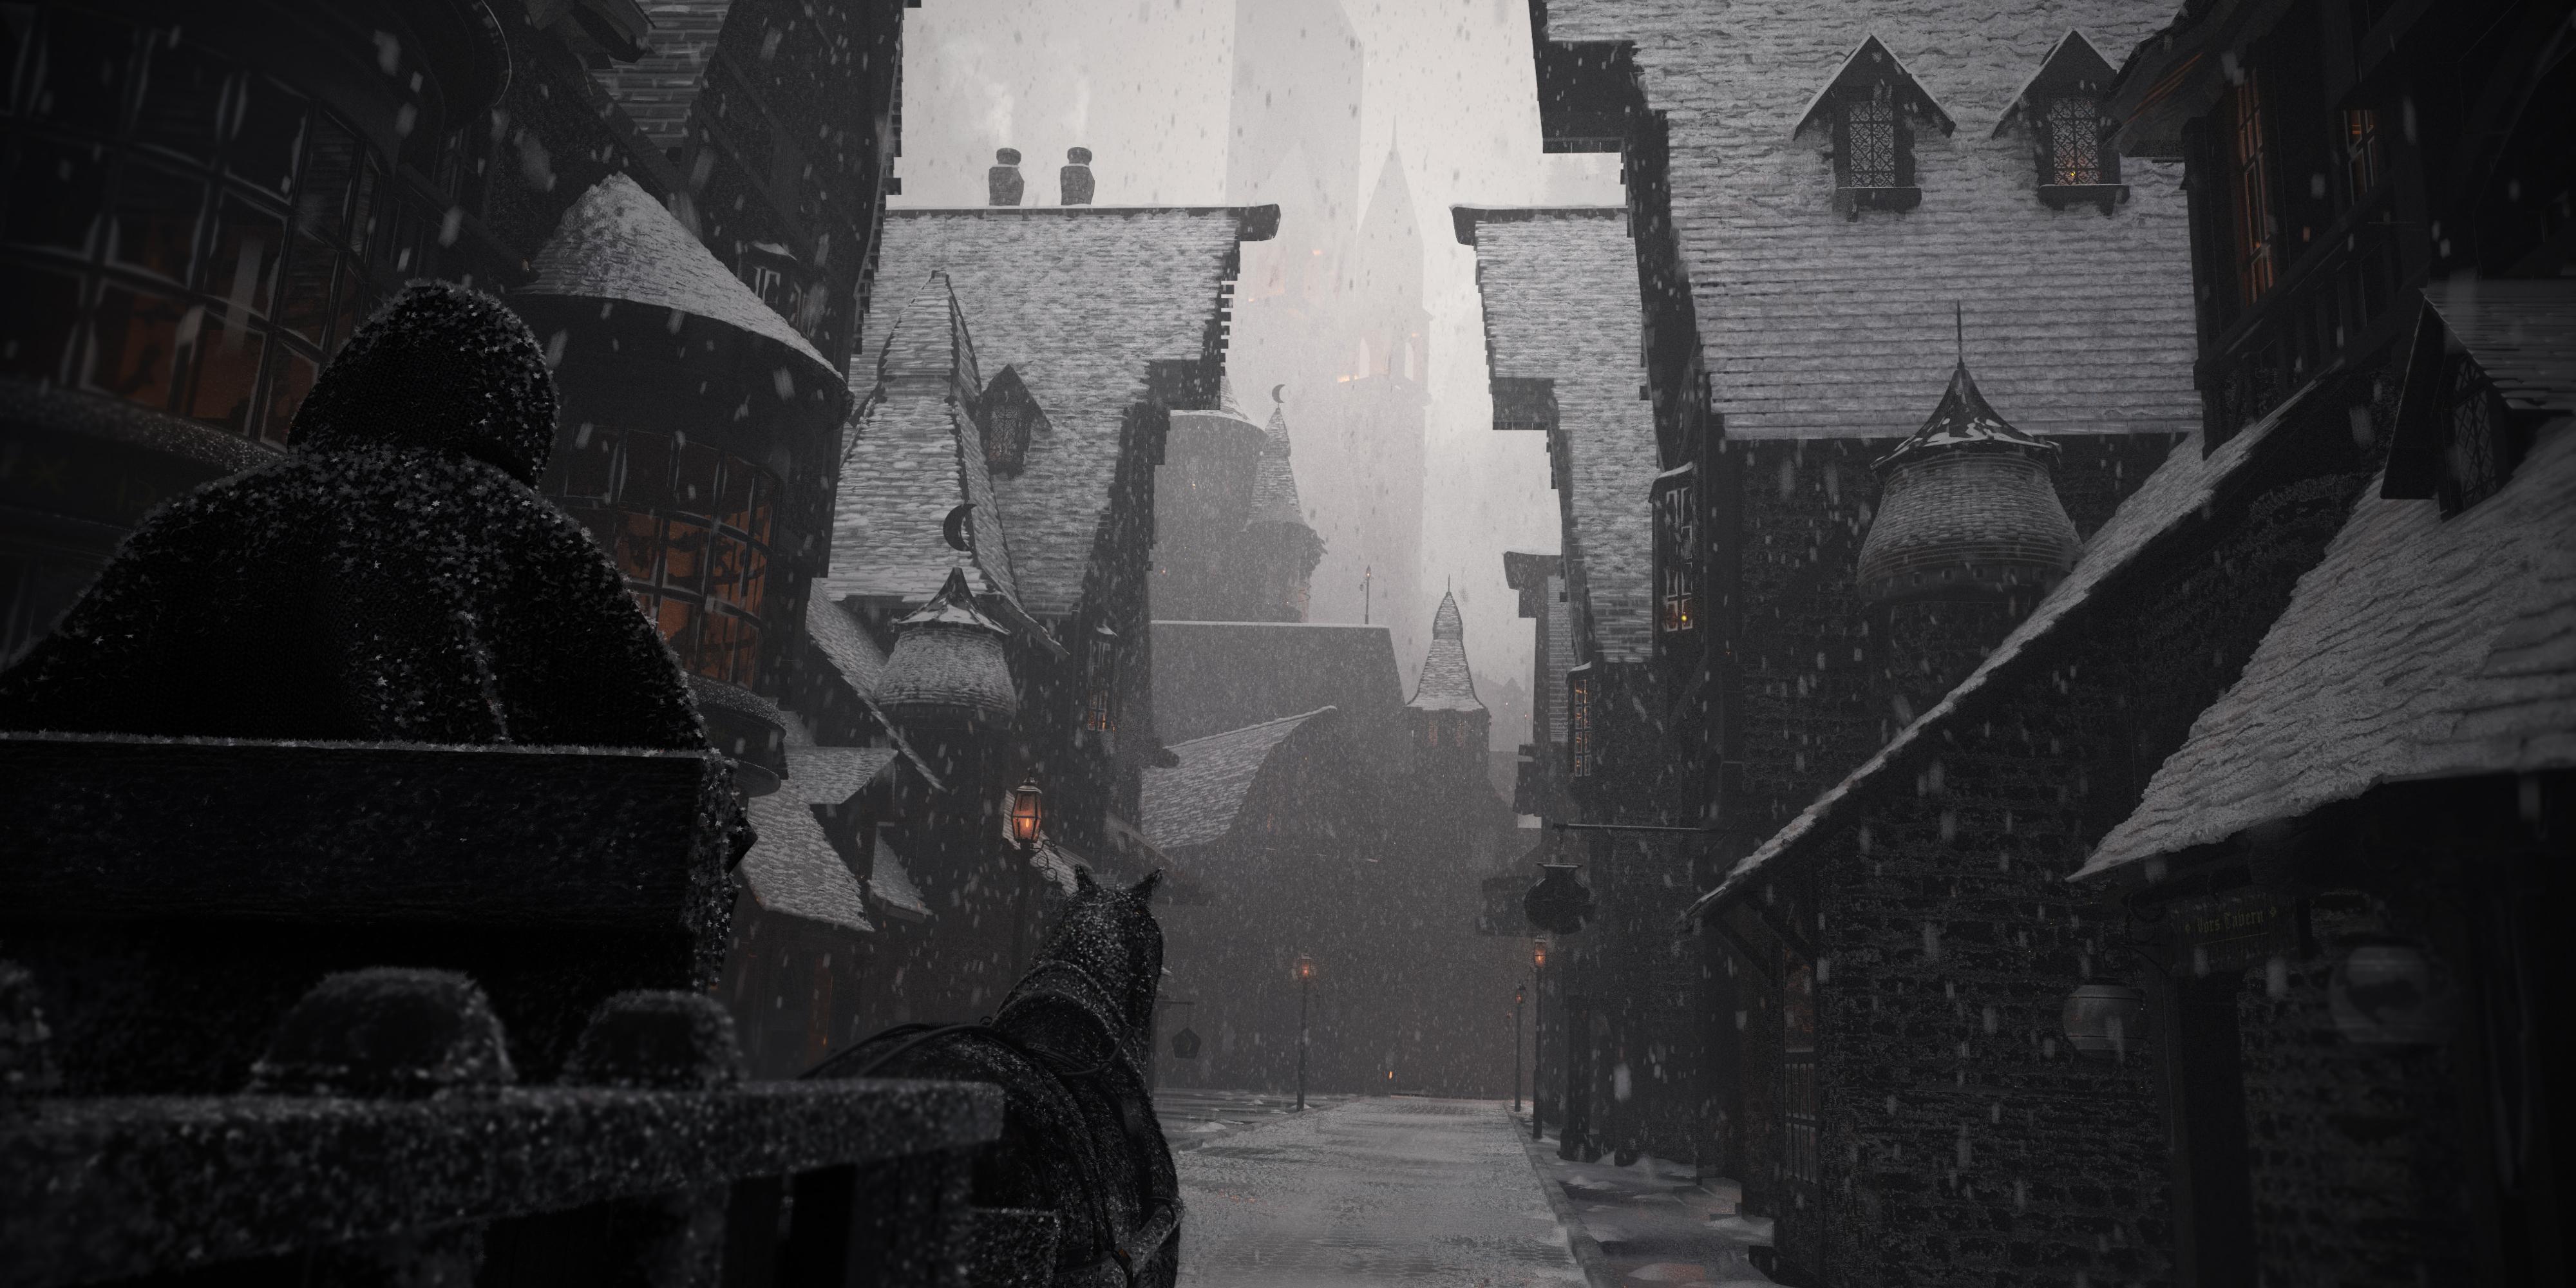 Diagon Alley, Old Winter